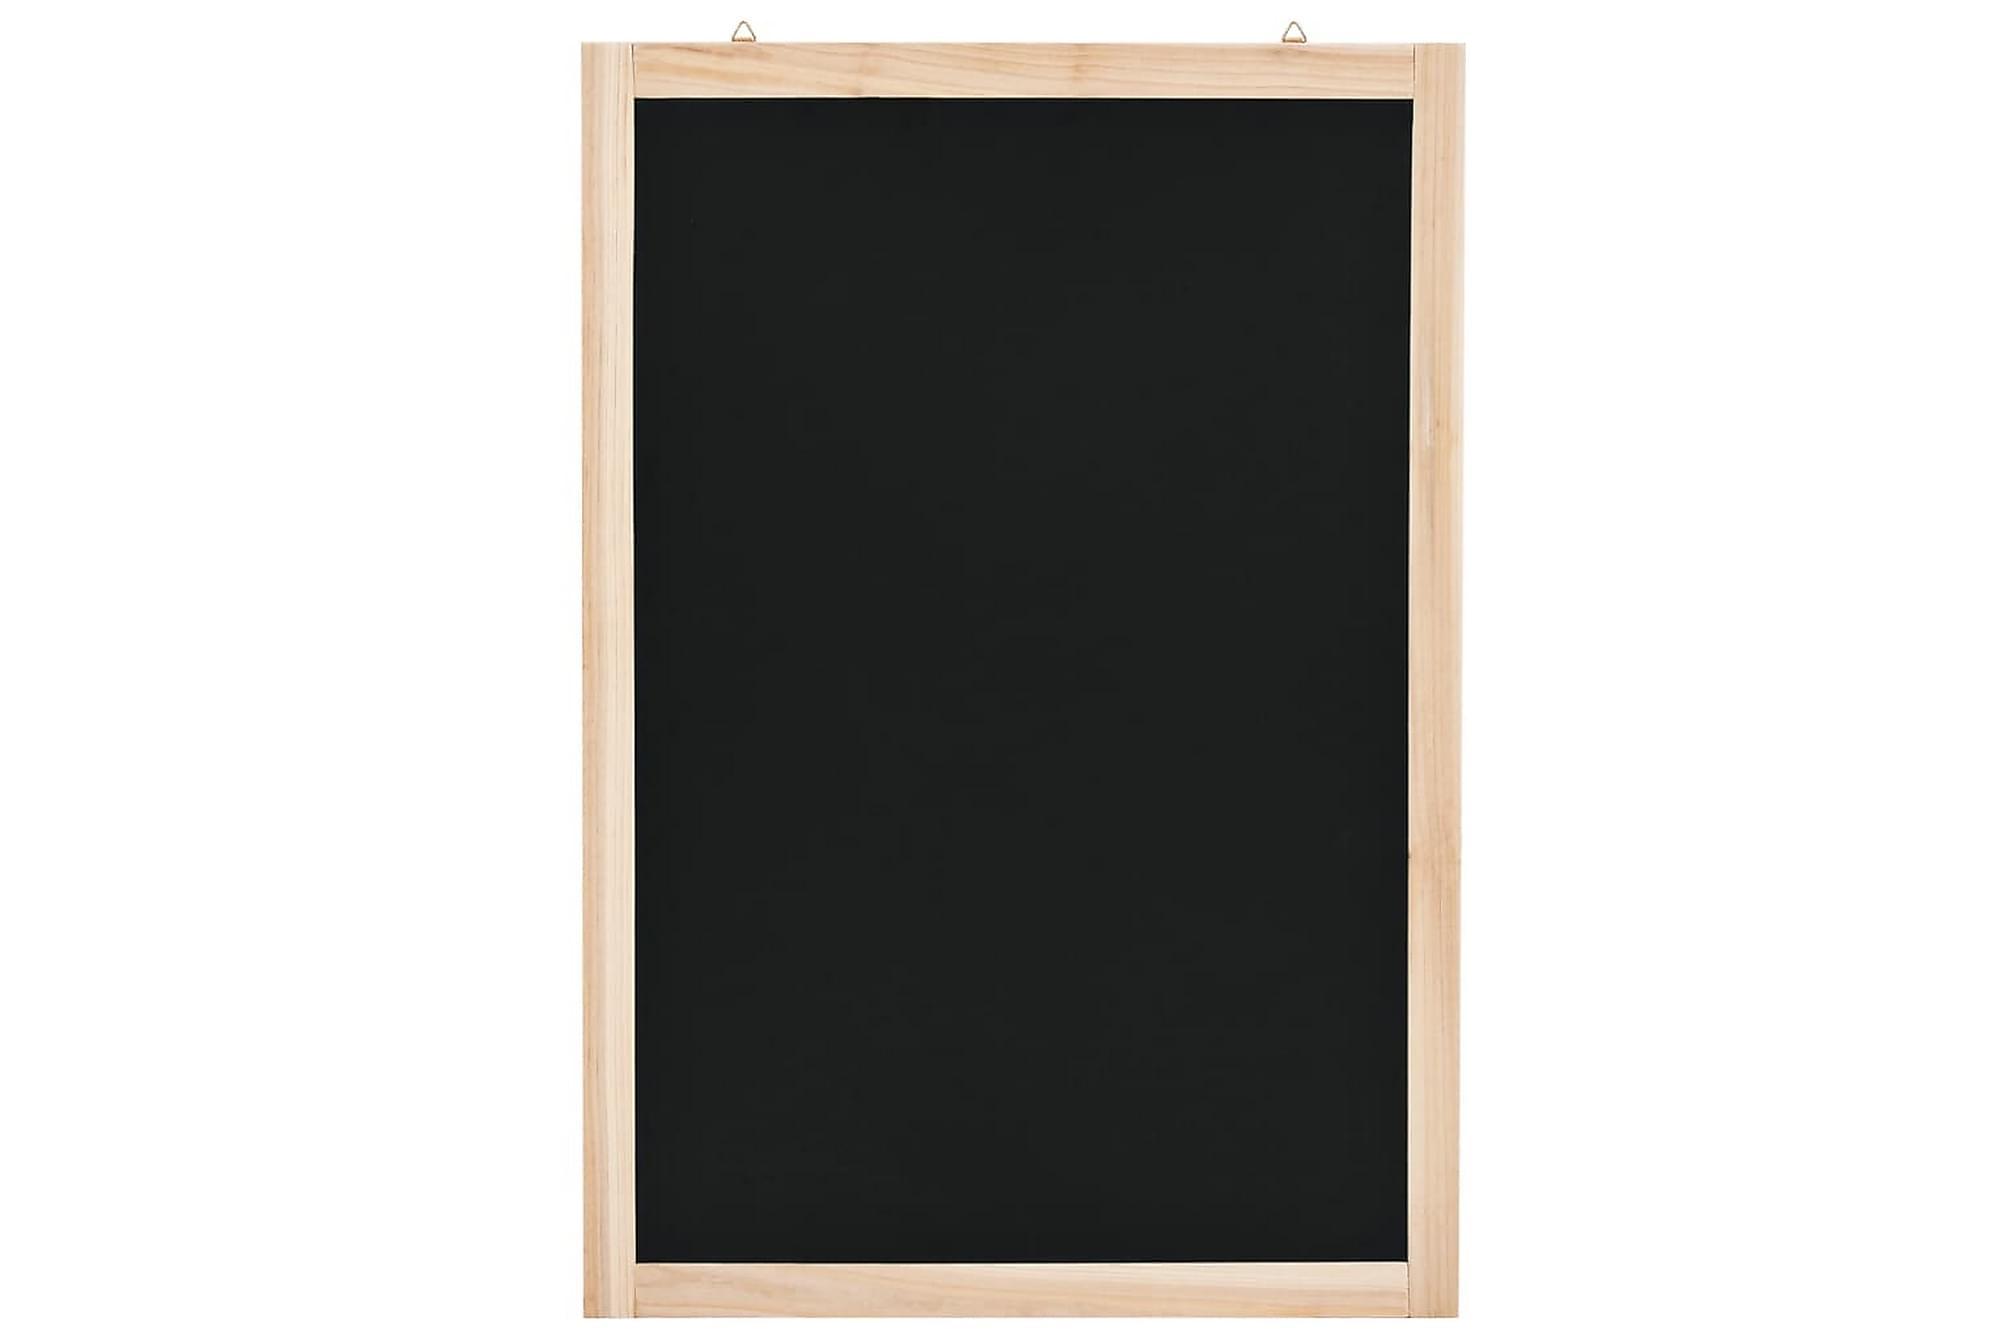 Väggmonterad griffeltavla cedarträ 40x60 cm, Whiteboards & griffeltavlor